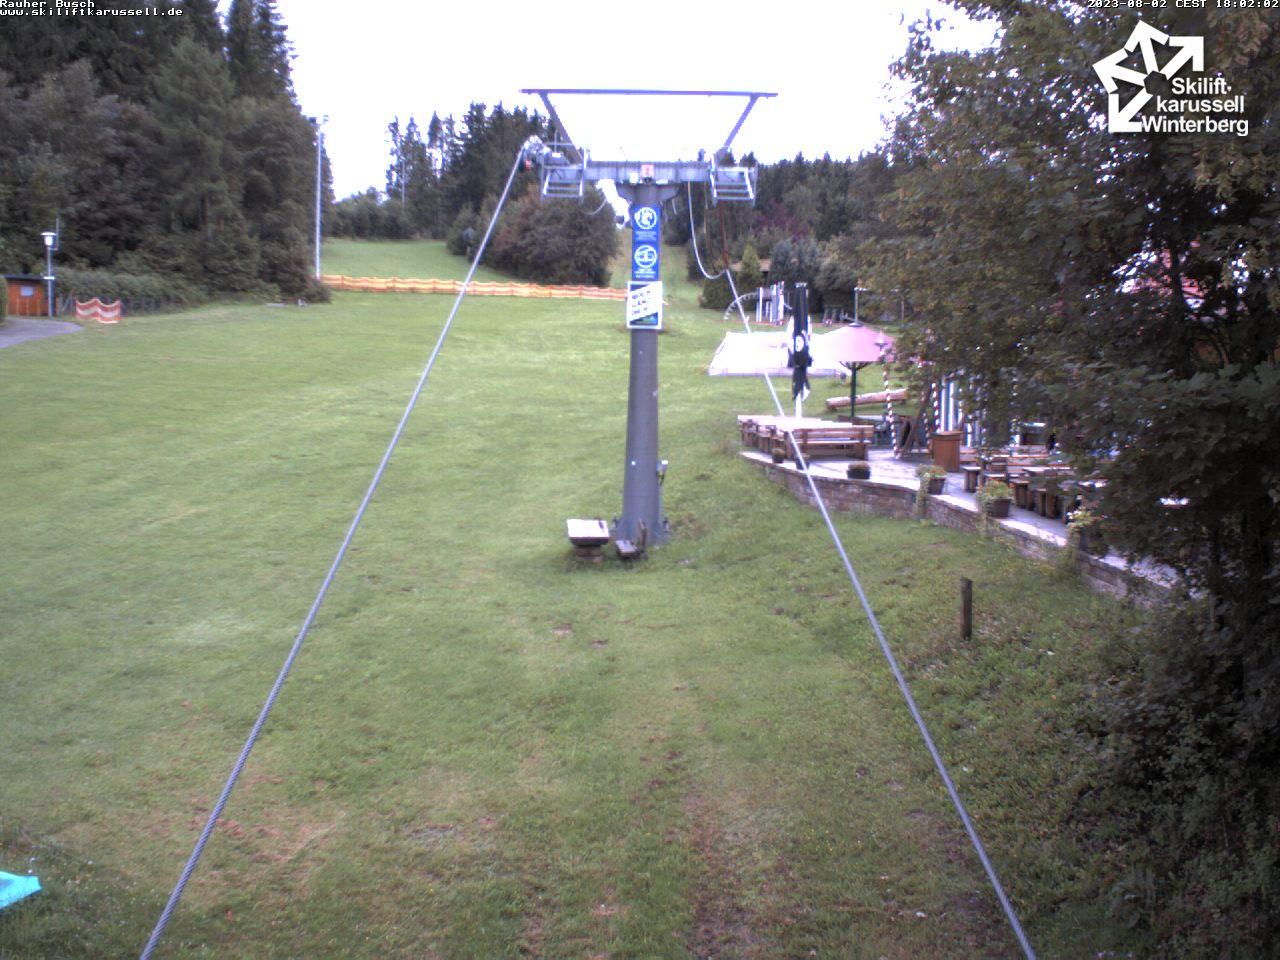 Skiliftkarussell Winterberg - Webcam 3